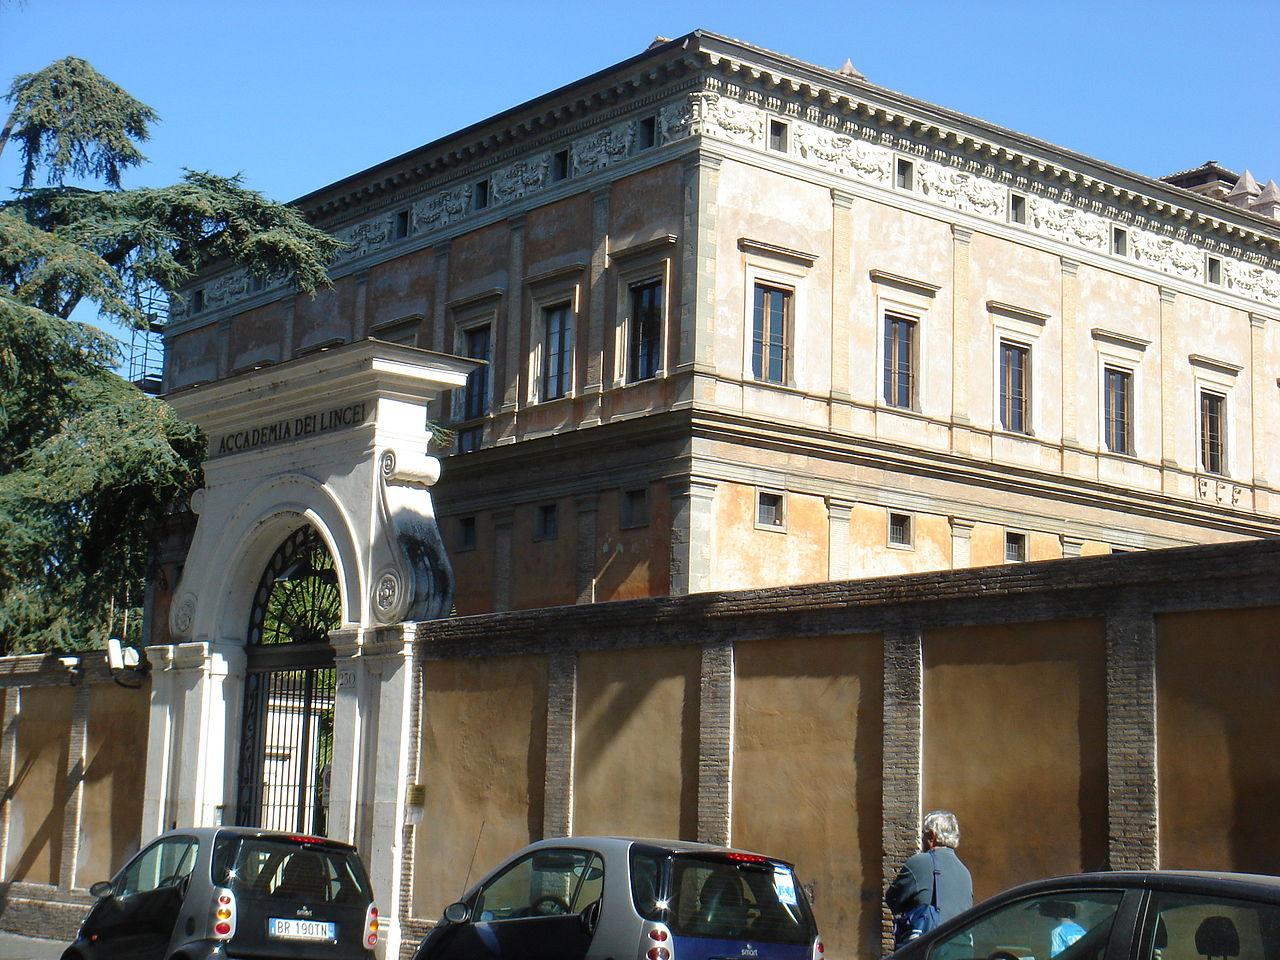 https://upload.wikimedia.org/wikipedia/commons/thumb/0/03/Trastevere_-_Accademia_dei_Lincei_alla_Lungara_01593.JPG/1280px-Trastevere_-_Accademia_dei_Lincei_alla_Lungara_01593.JPG